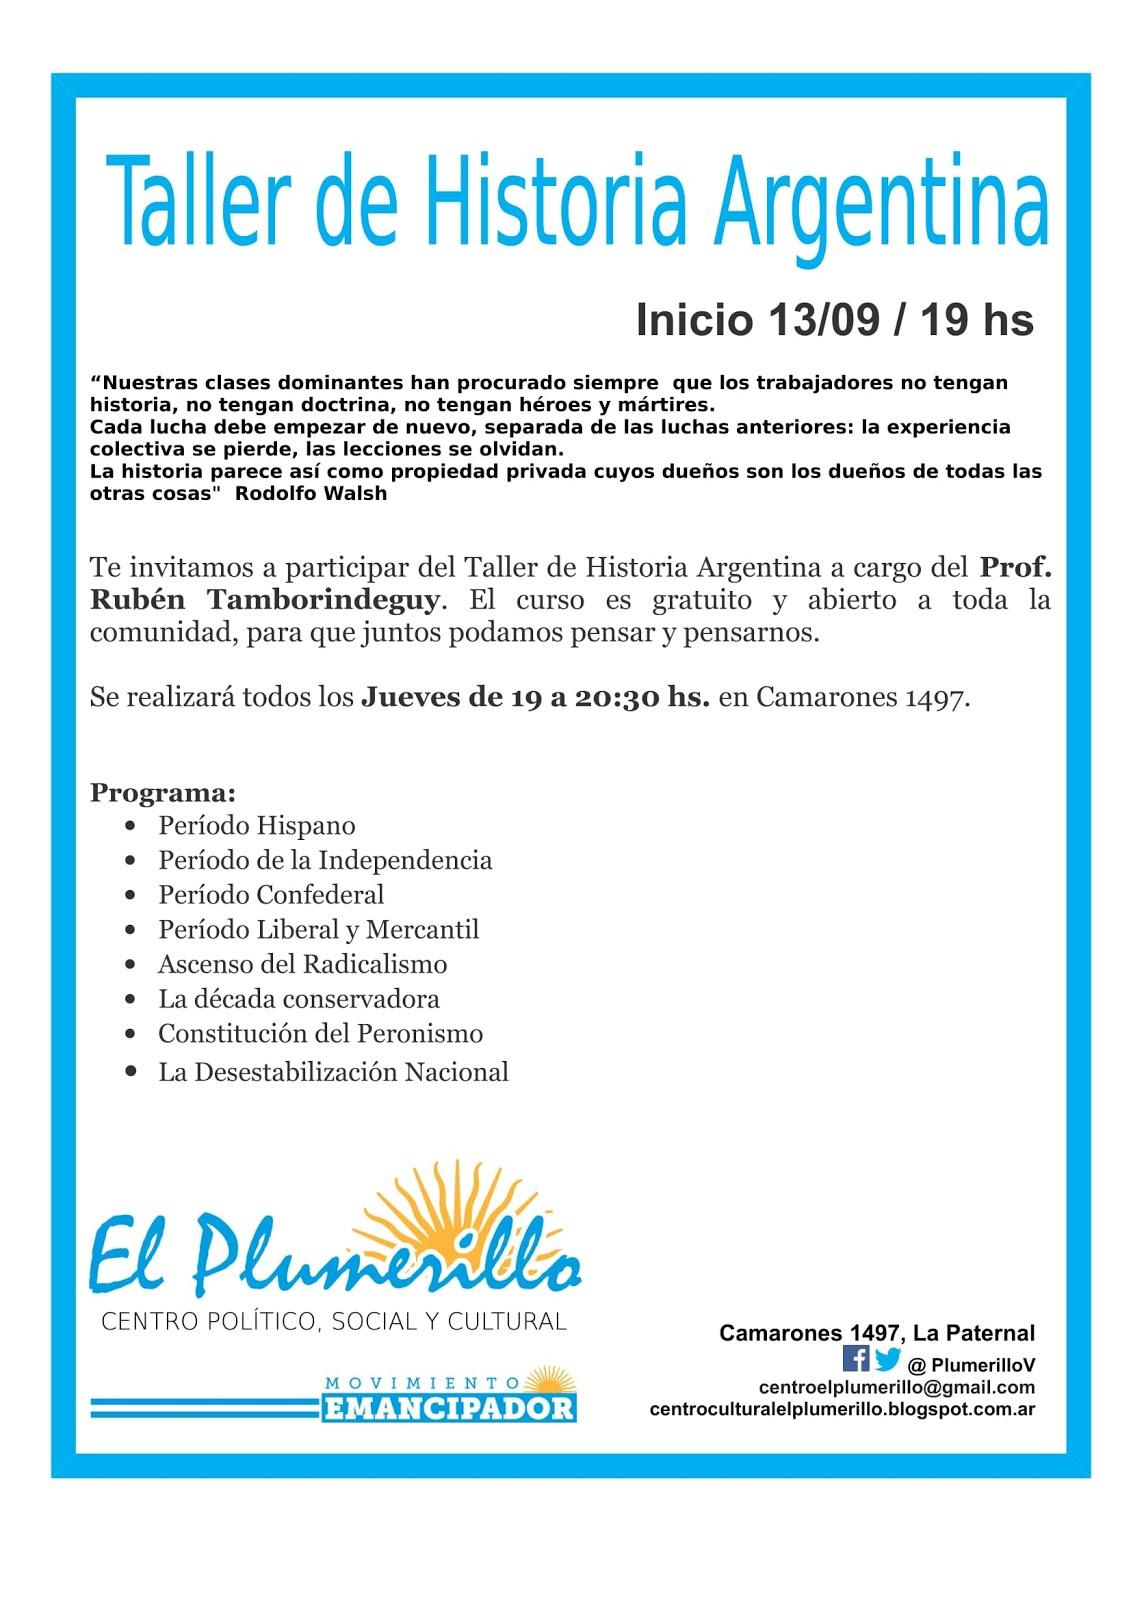 Taller de Historia Argentina - Jueves 19 hs.